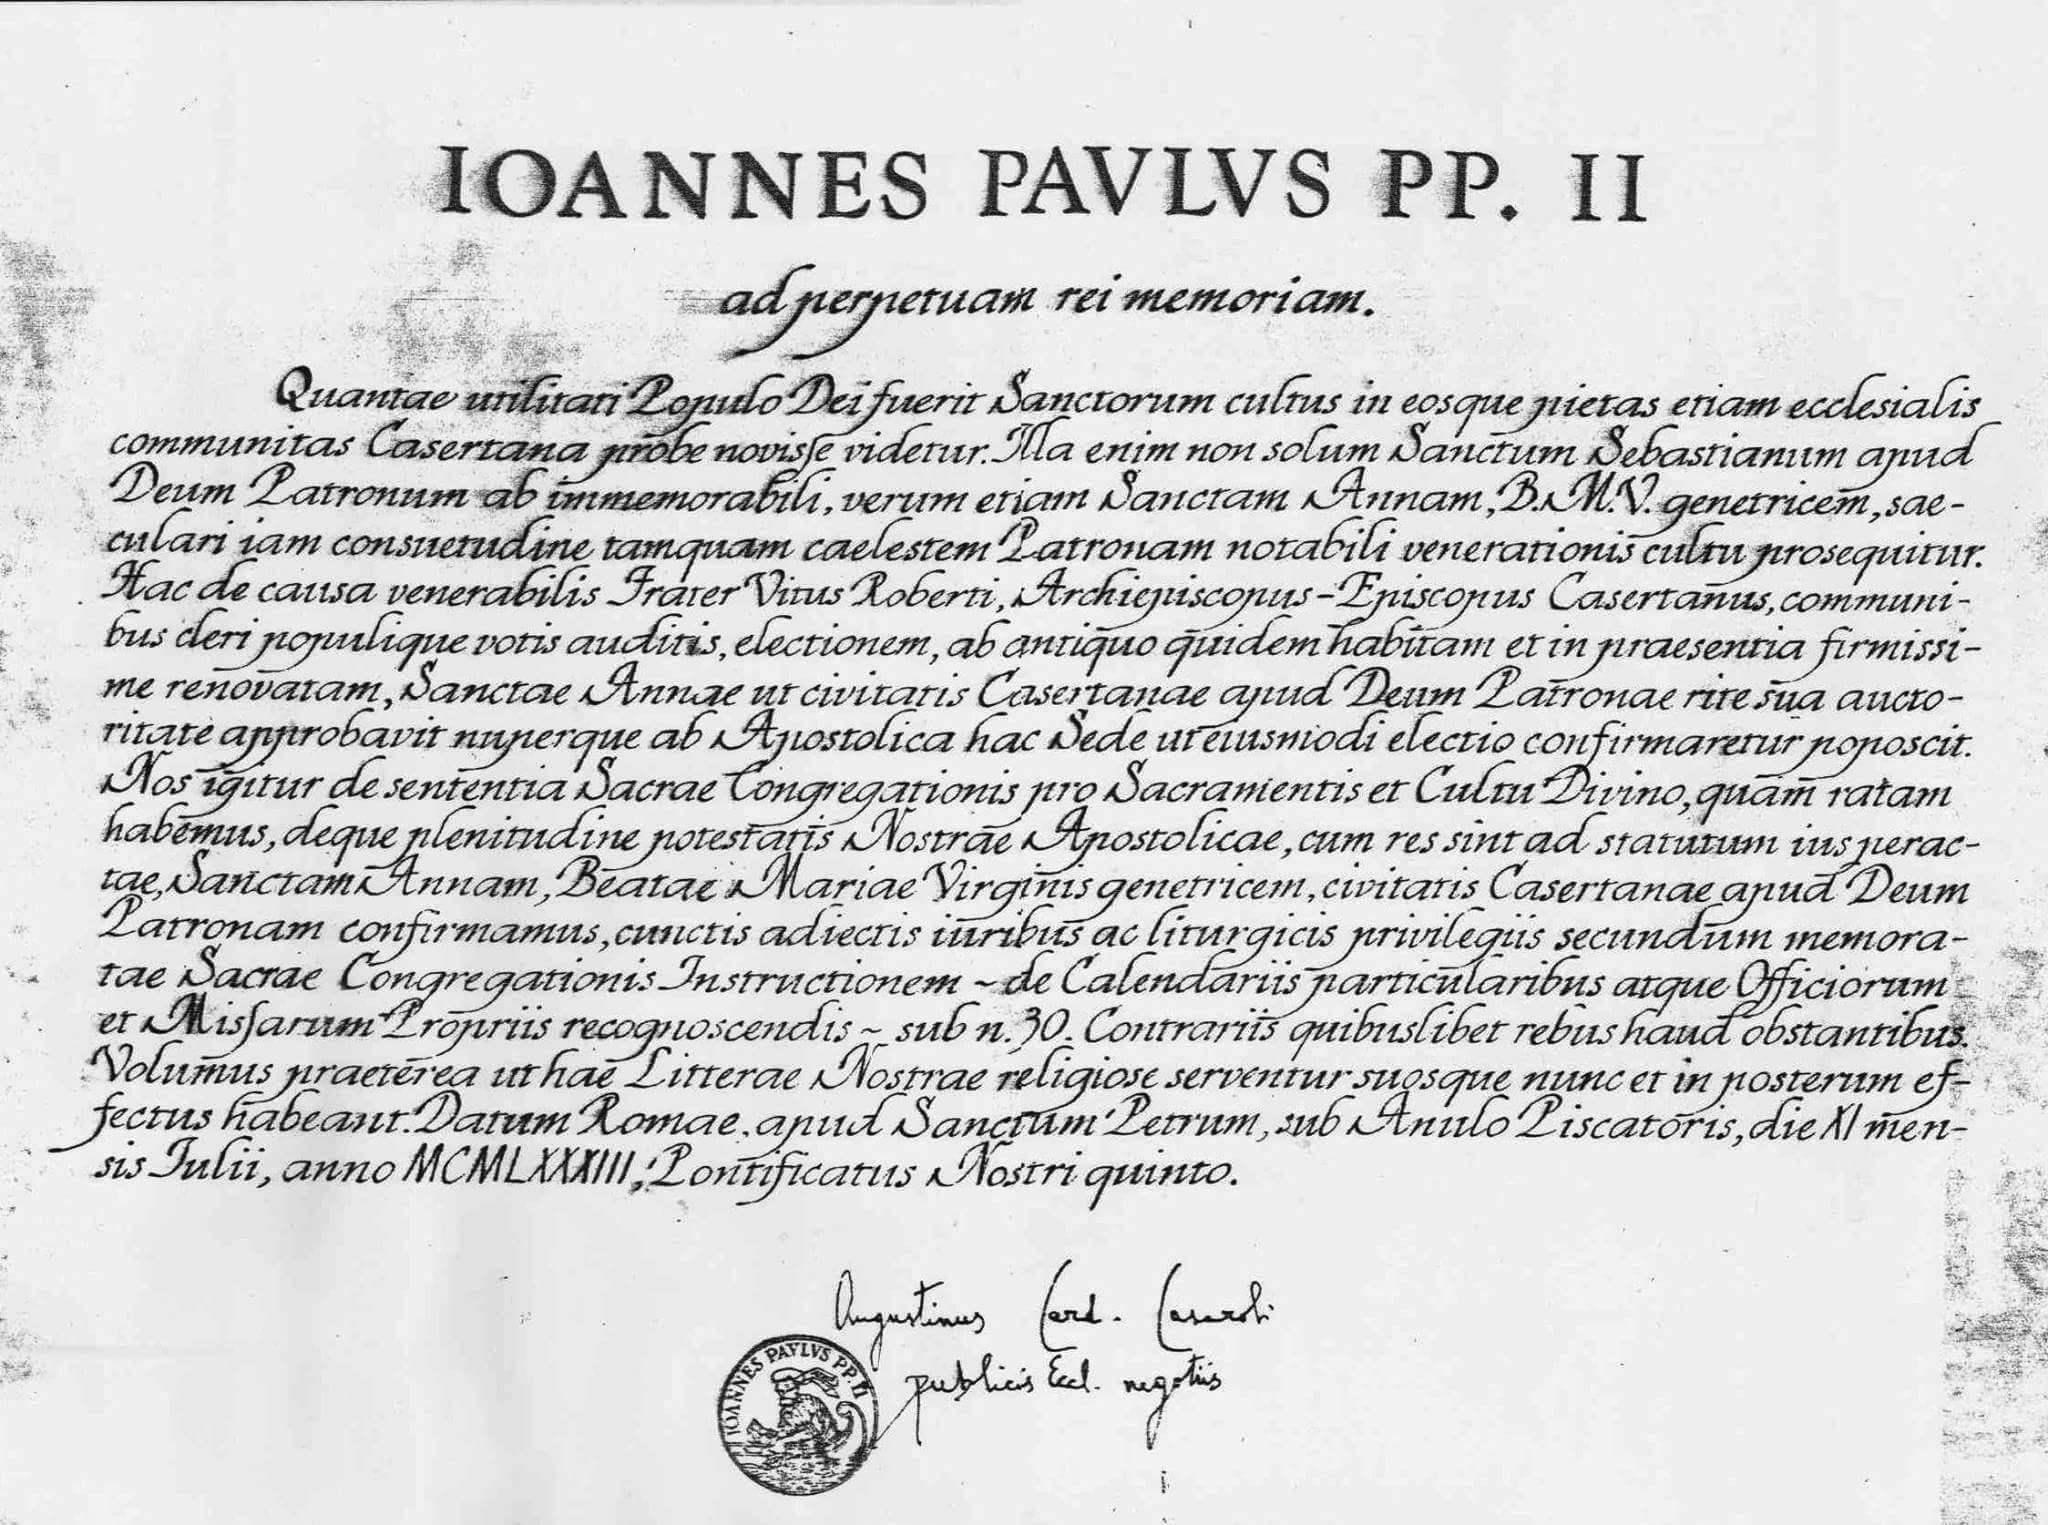 Decreto Pontificio Patrocinio Sant'Anna - Caserta - 19830711